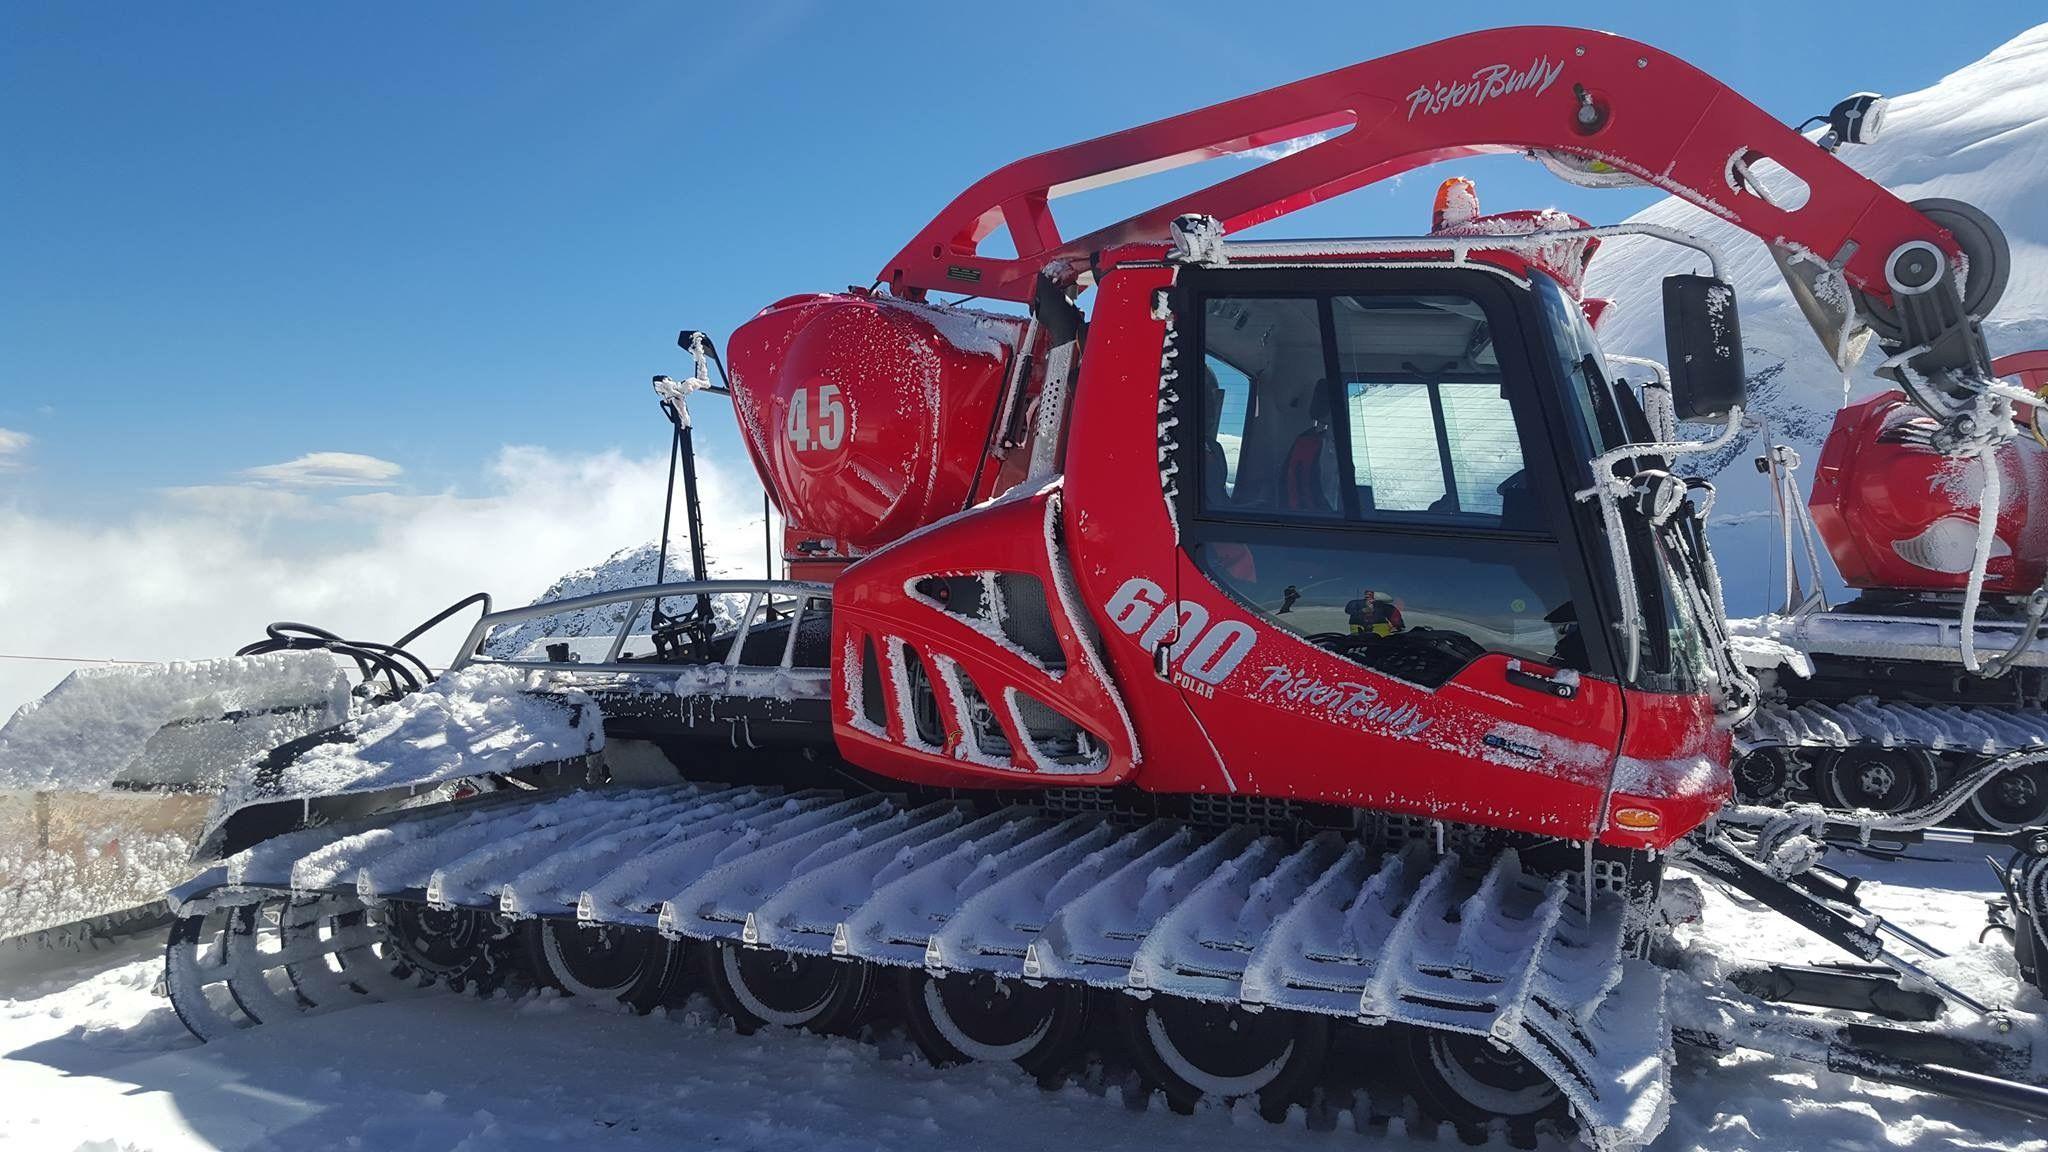 Pisten Bully | Snowcats-Grooming | Monster trucks, Vehicles, Tractors